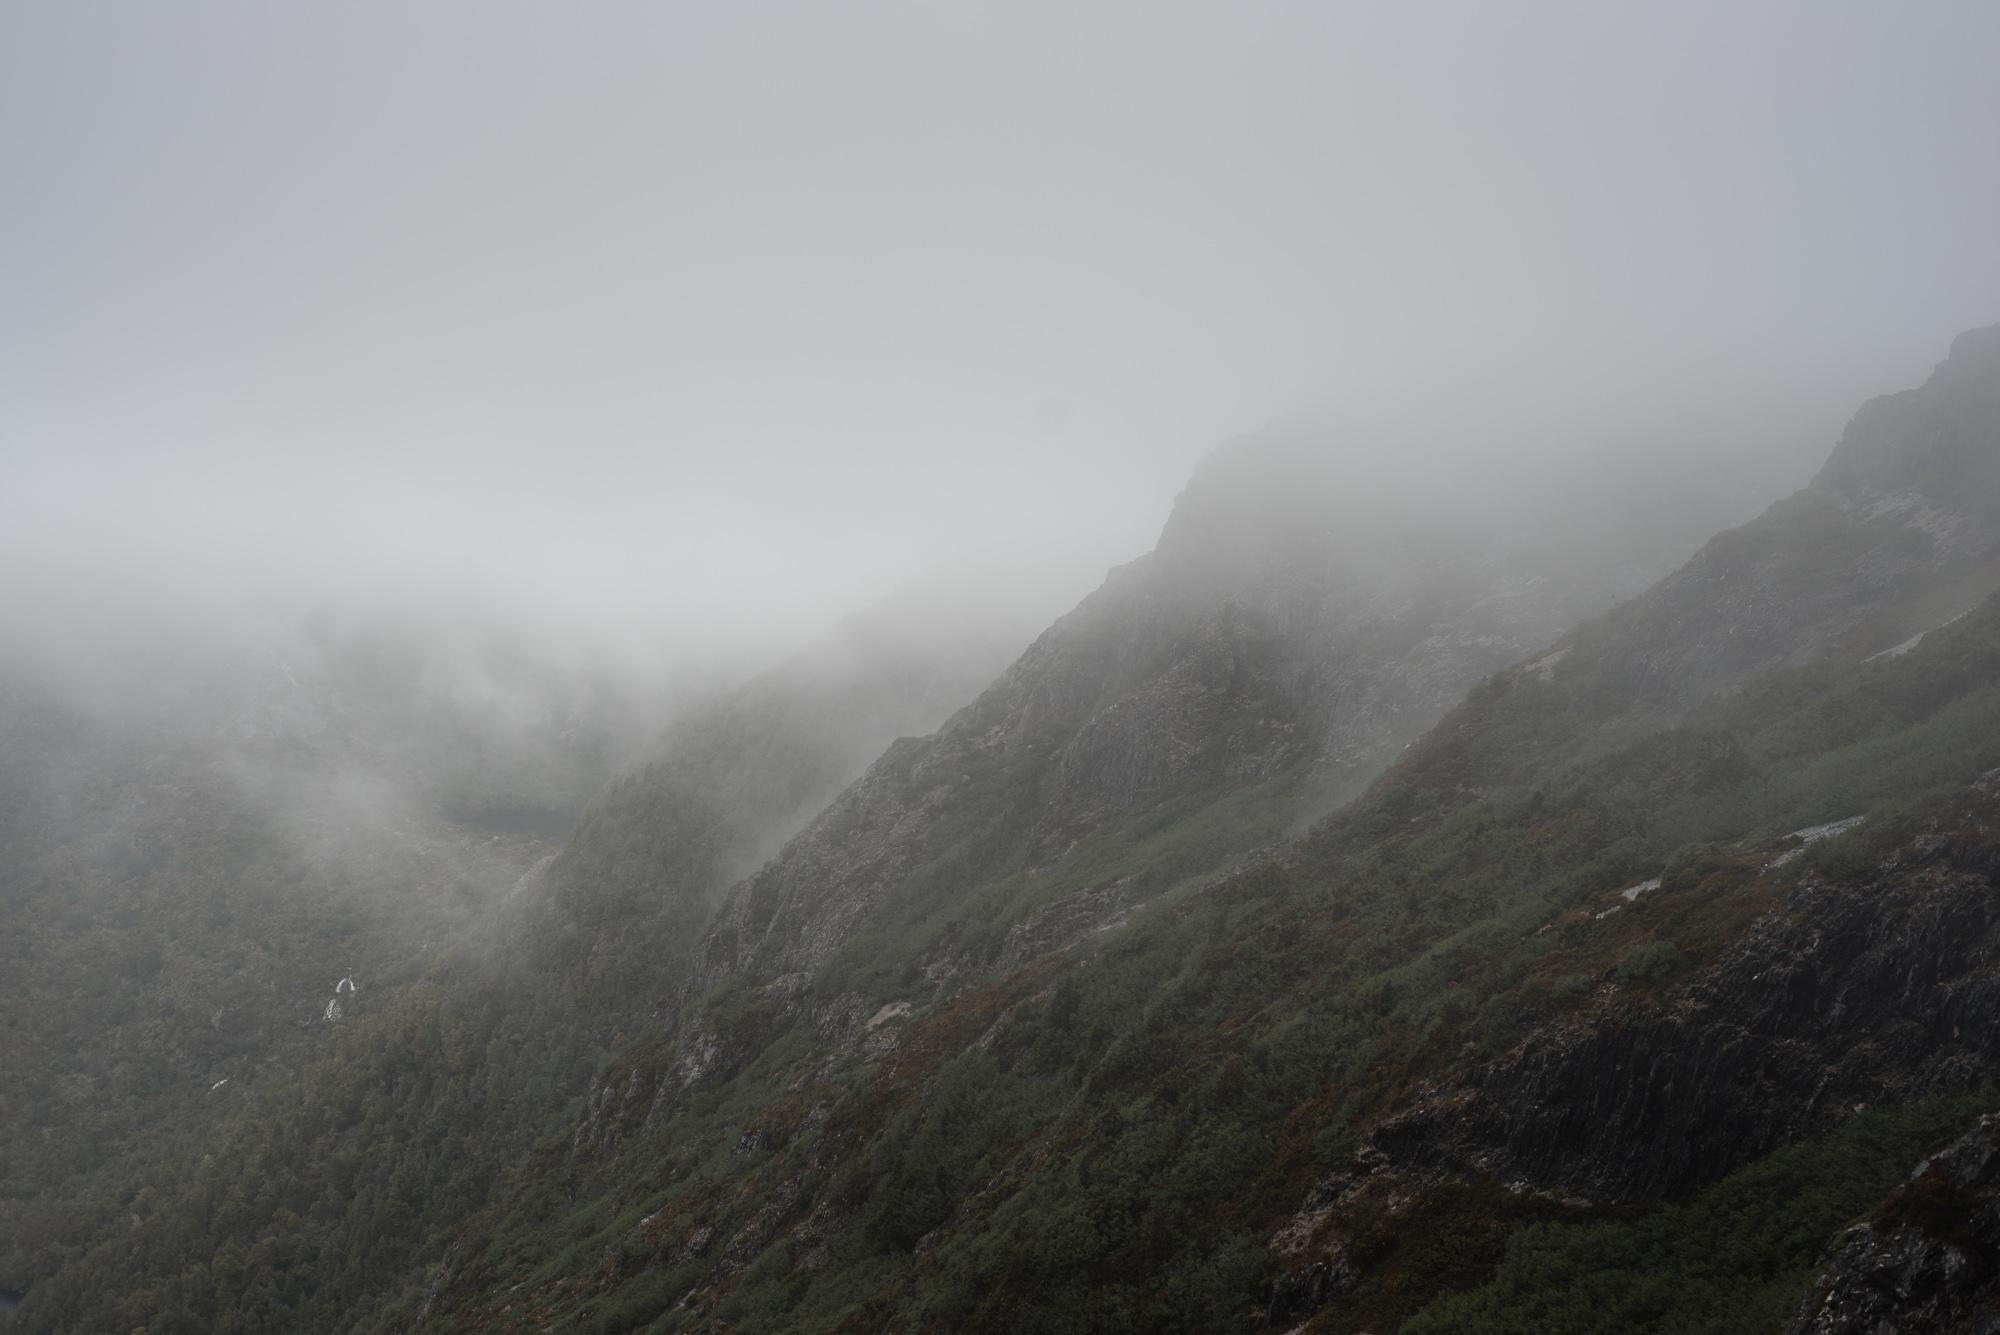 cradle mountain fog